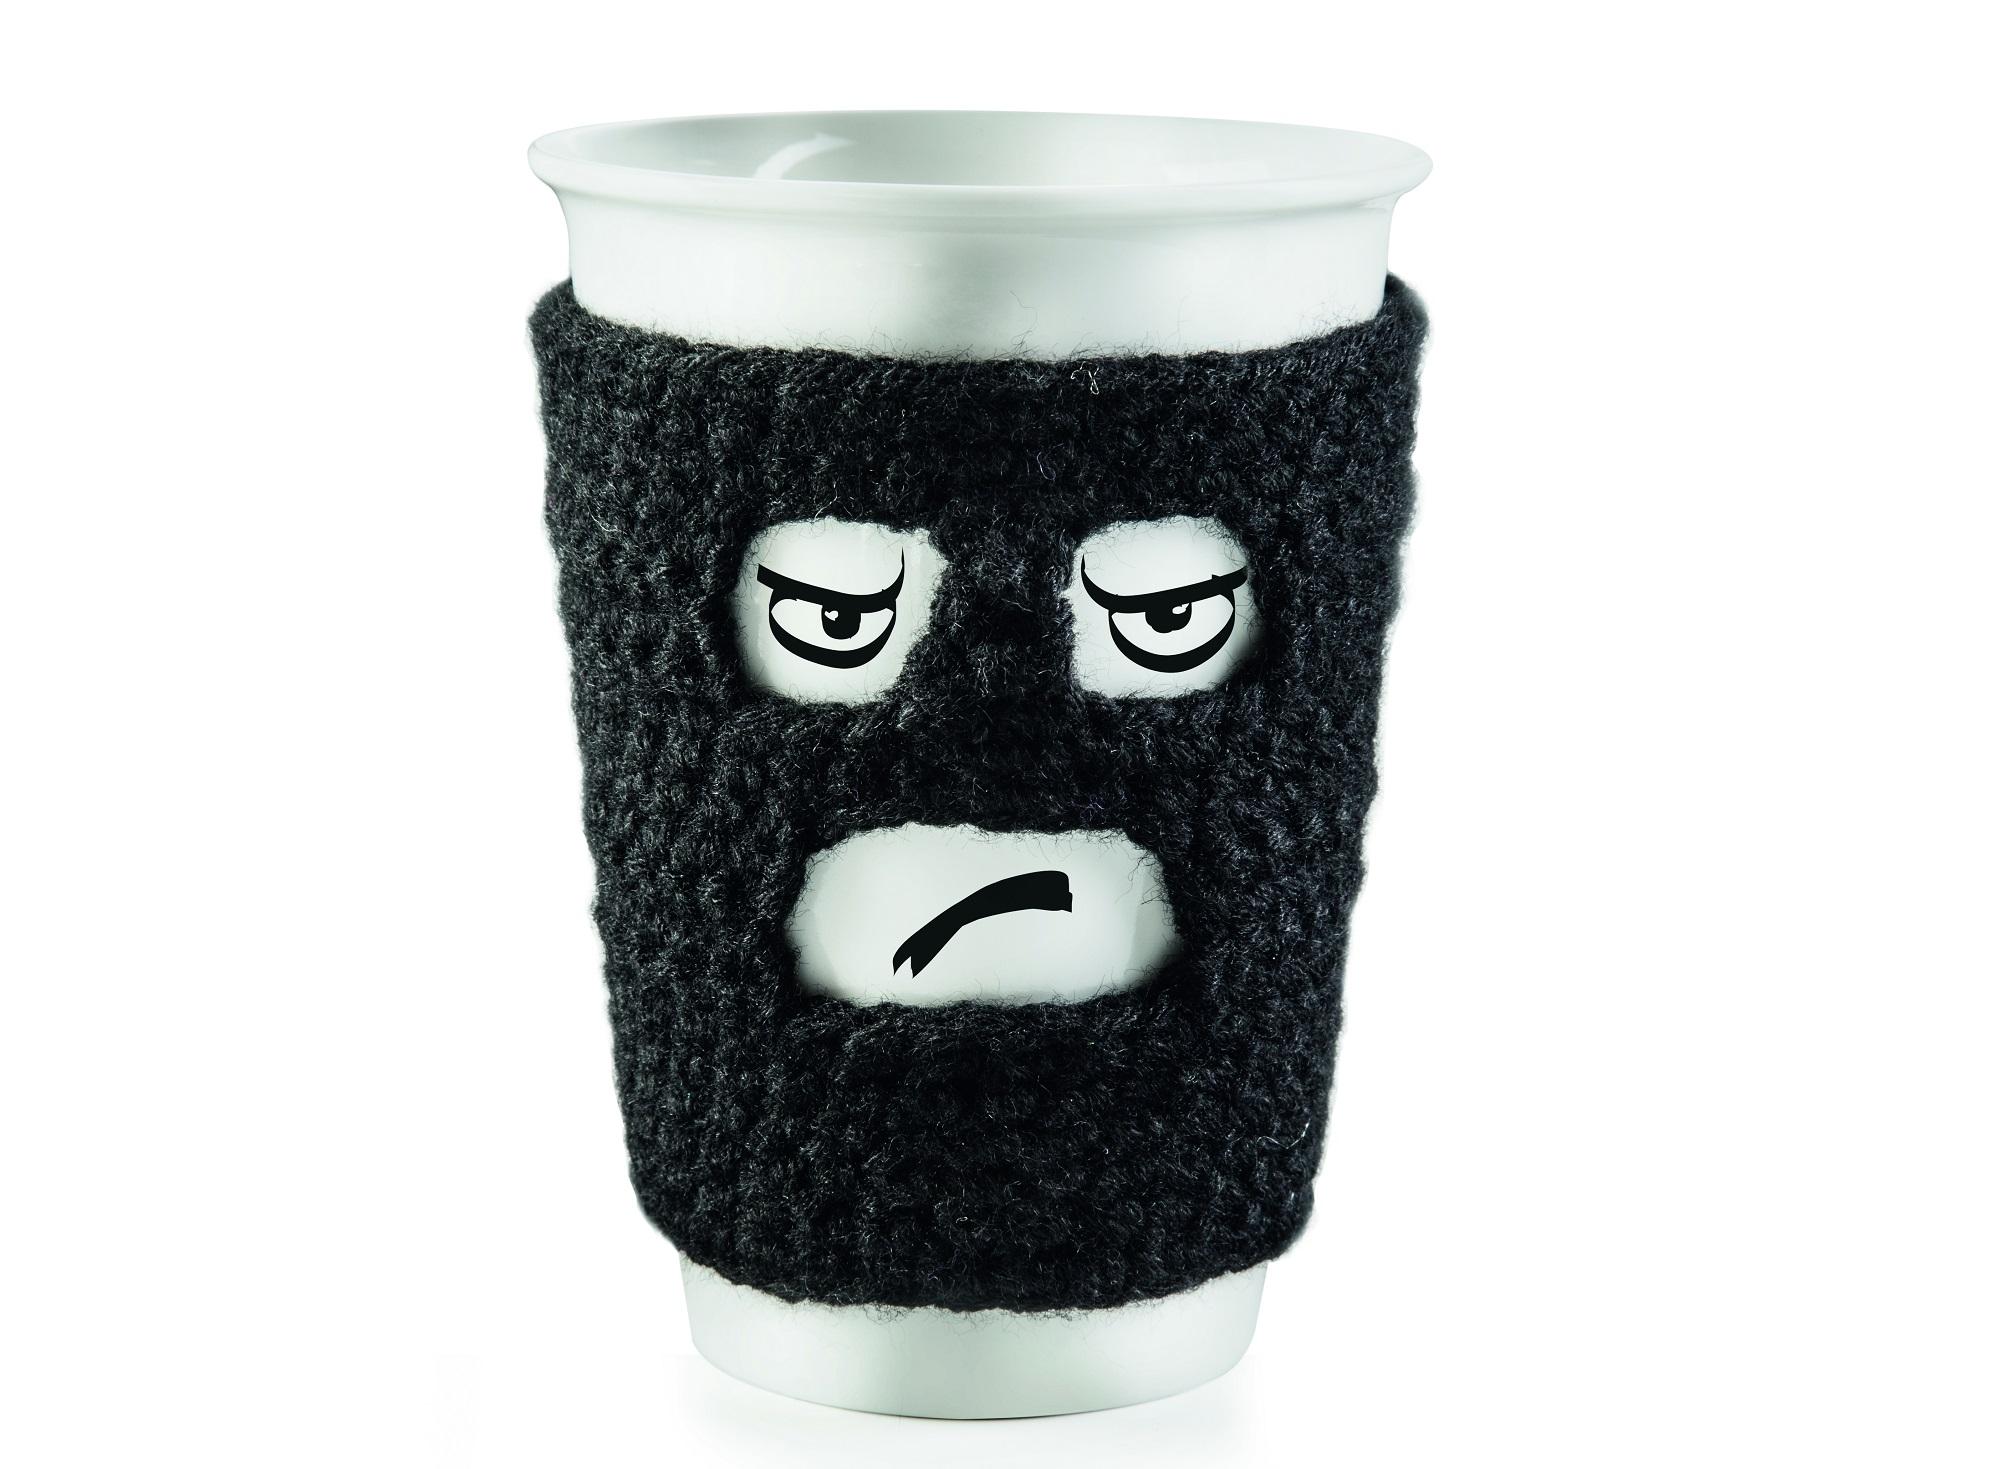 Кружка Morning GangsterЧайные пары, чашки и кружки<br>Кружка Morning Gangster с вязанным чехлом,&amp;amp;nbsp;&amp;lt;div&amp;gt;Объем 250 мл&amp;lt;br&amp;gt;&amp;lt;/div&amp;gt;<br><br>Material: Фарфор<br>Width см: 12<br>Depth см: 9<br>Height см: 9